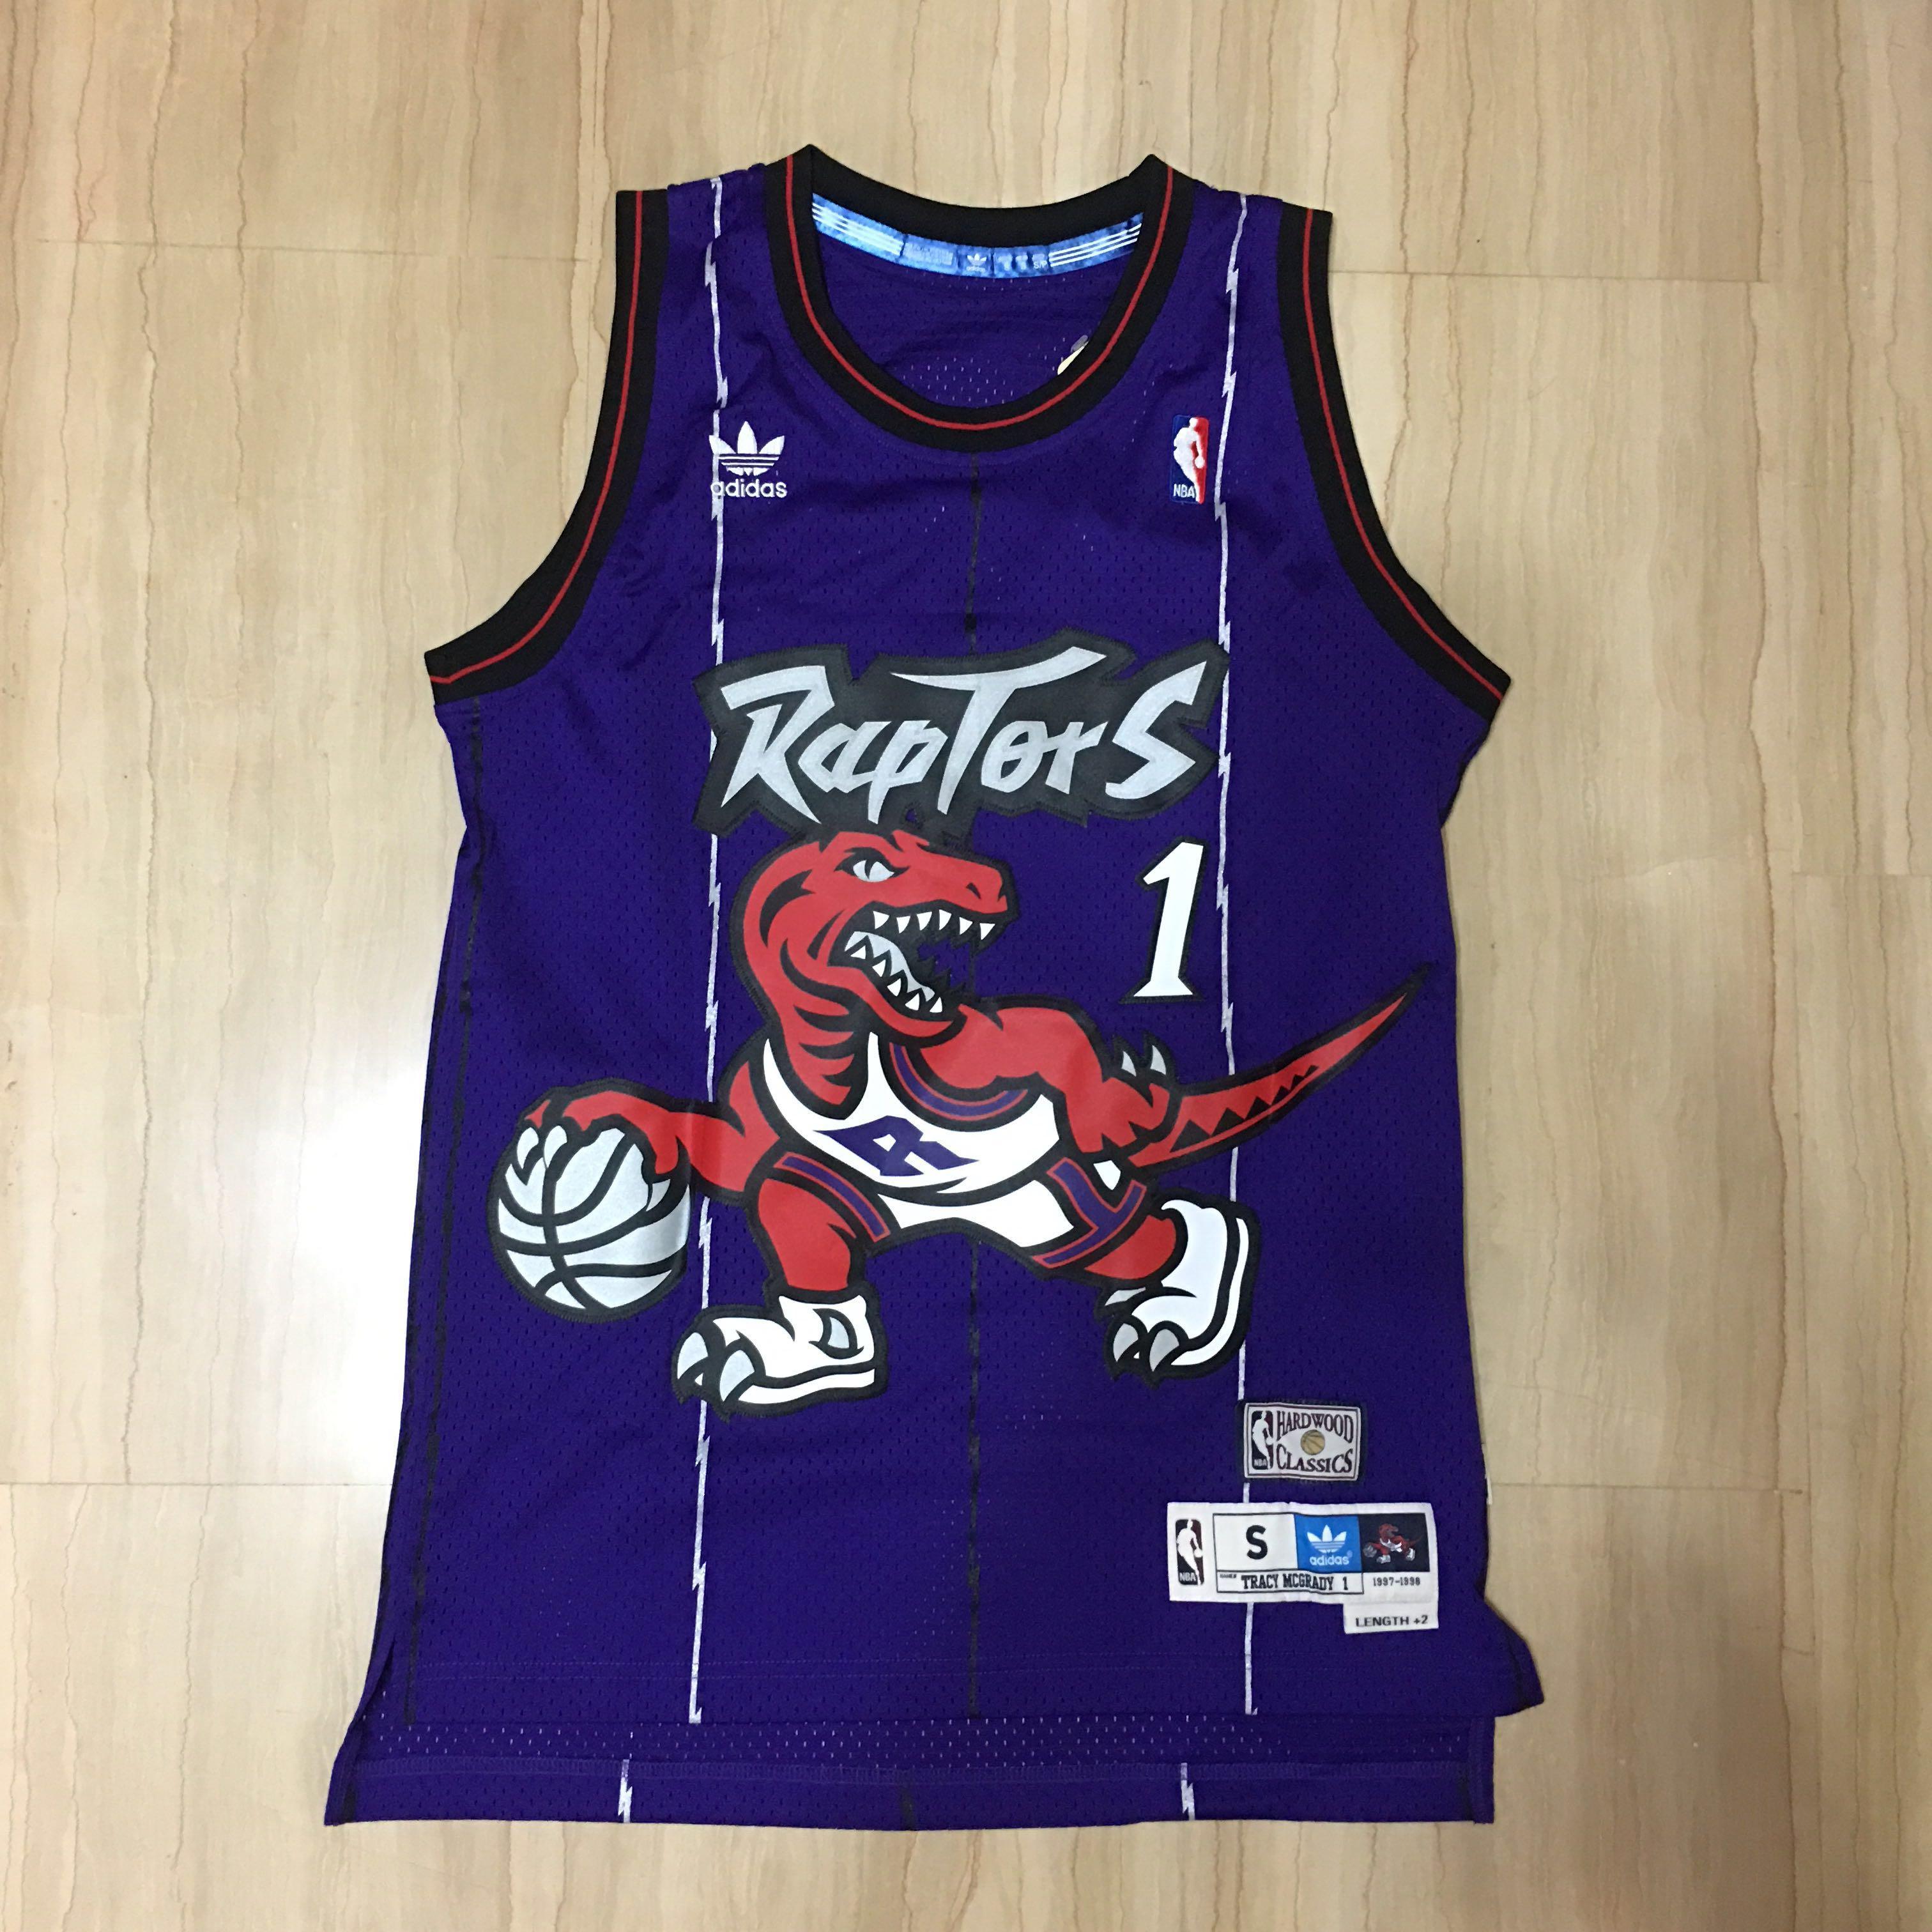 Adidas Originals McGrady Basketball Jersey, Men's Fashion ...